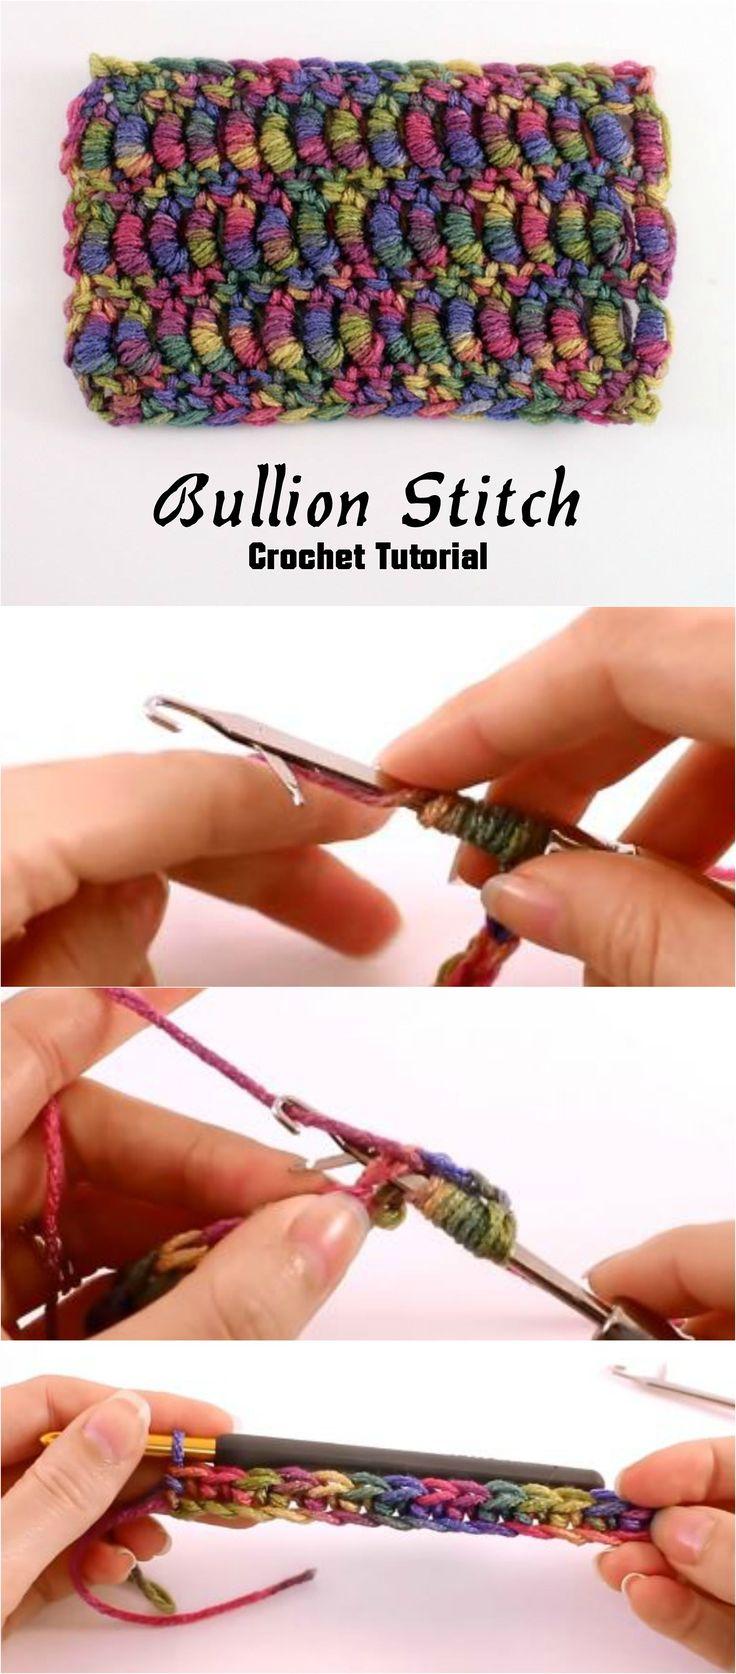 Crochet Bullion Stitch